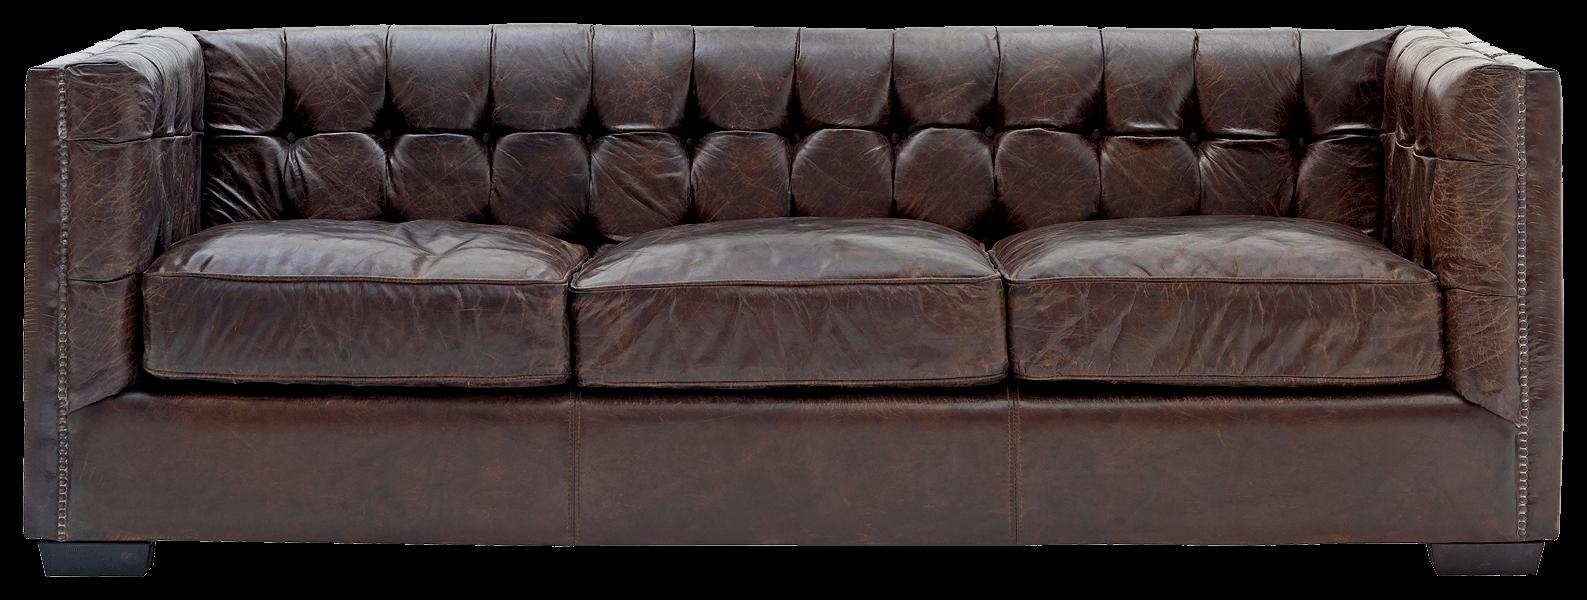 Leather Sofa transparent PNG.